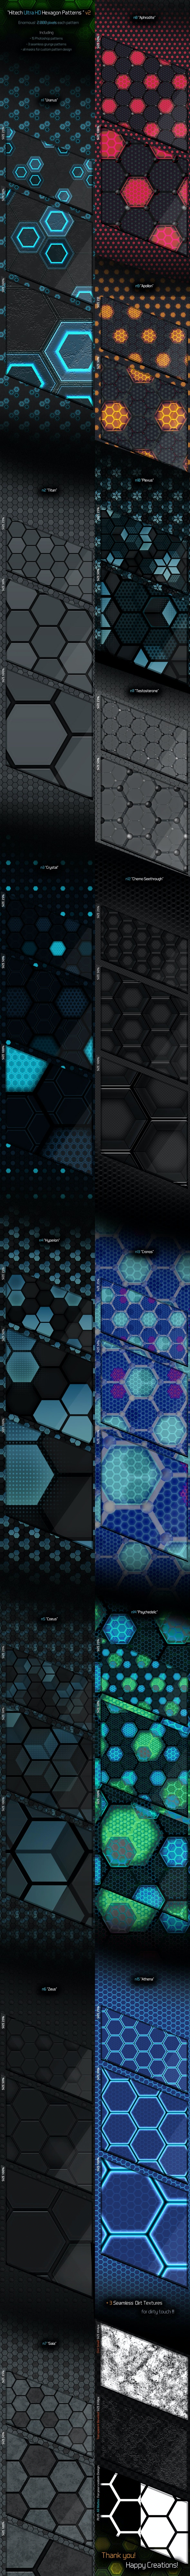 Ulta HD Hexagon Patterns v2 - Techno / Futuristic Textures / Fills / Patterns